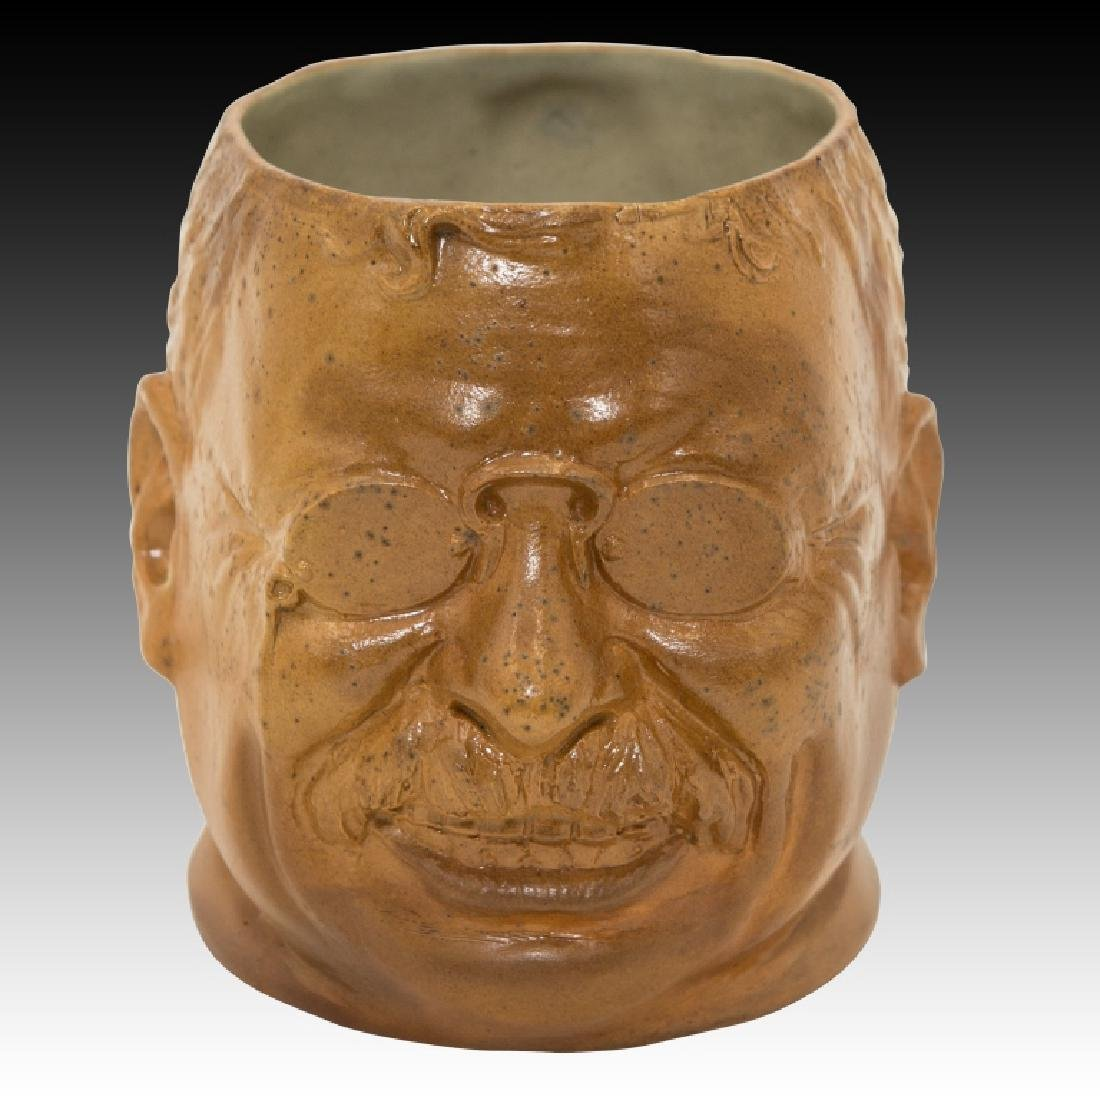 Doulton Lambeth Stoneware Teddy Roosevelt Jug